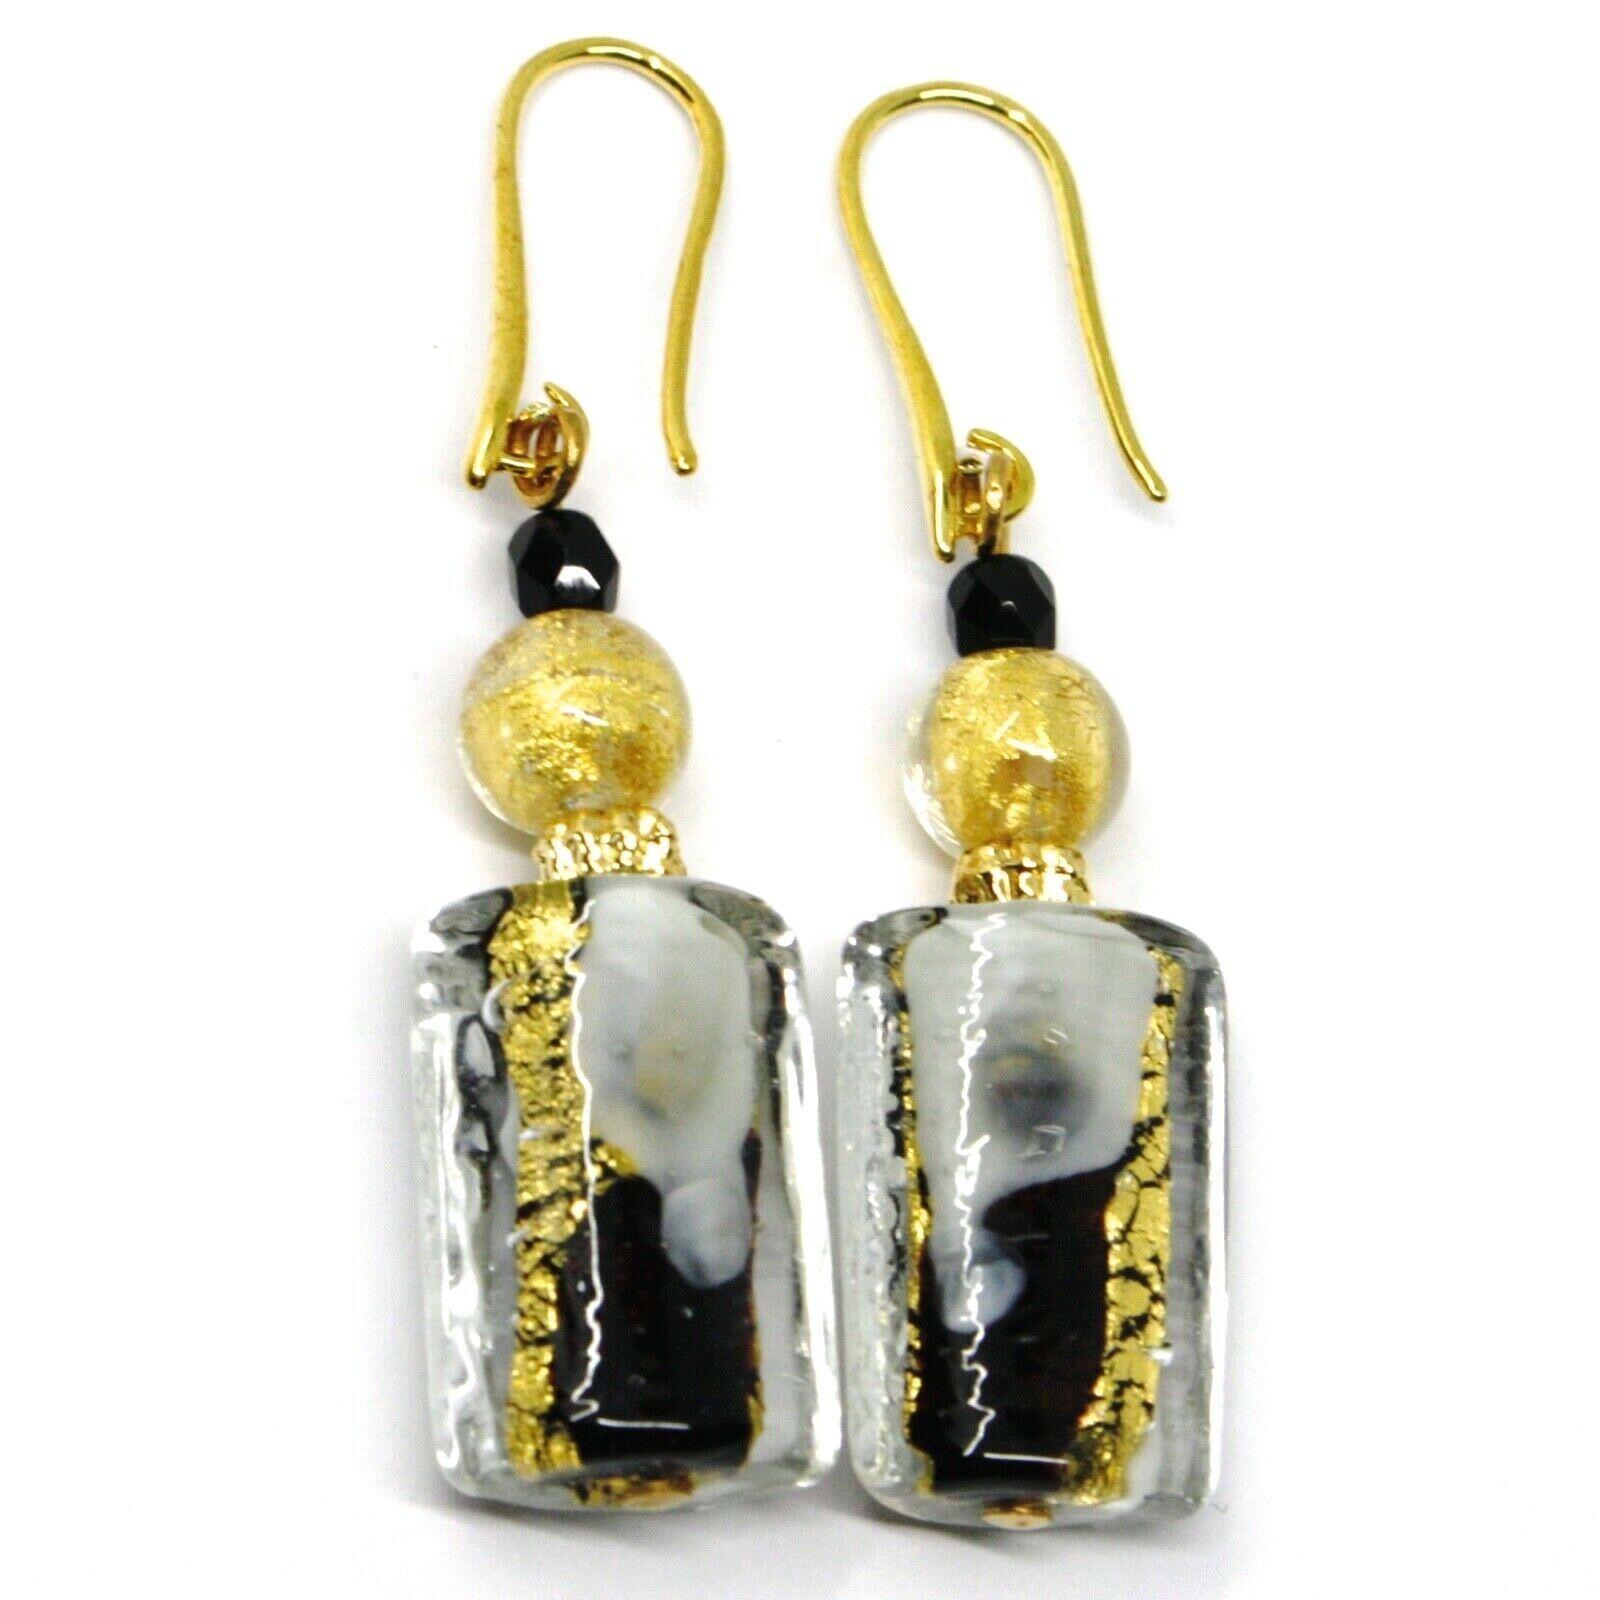 PENDANT EARRINGS BLACK MURANO GLASS RECTANGLE TUBE GOLD LEAF, MADE IN ITALY